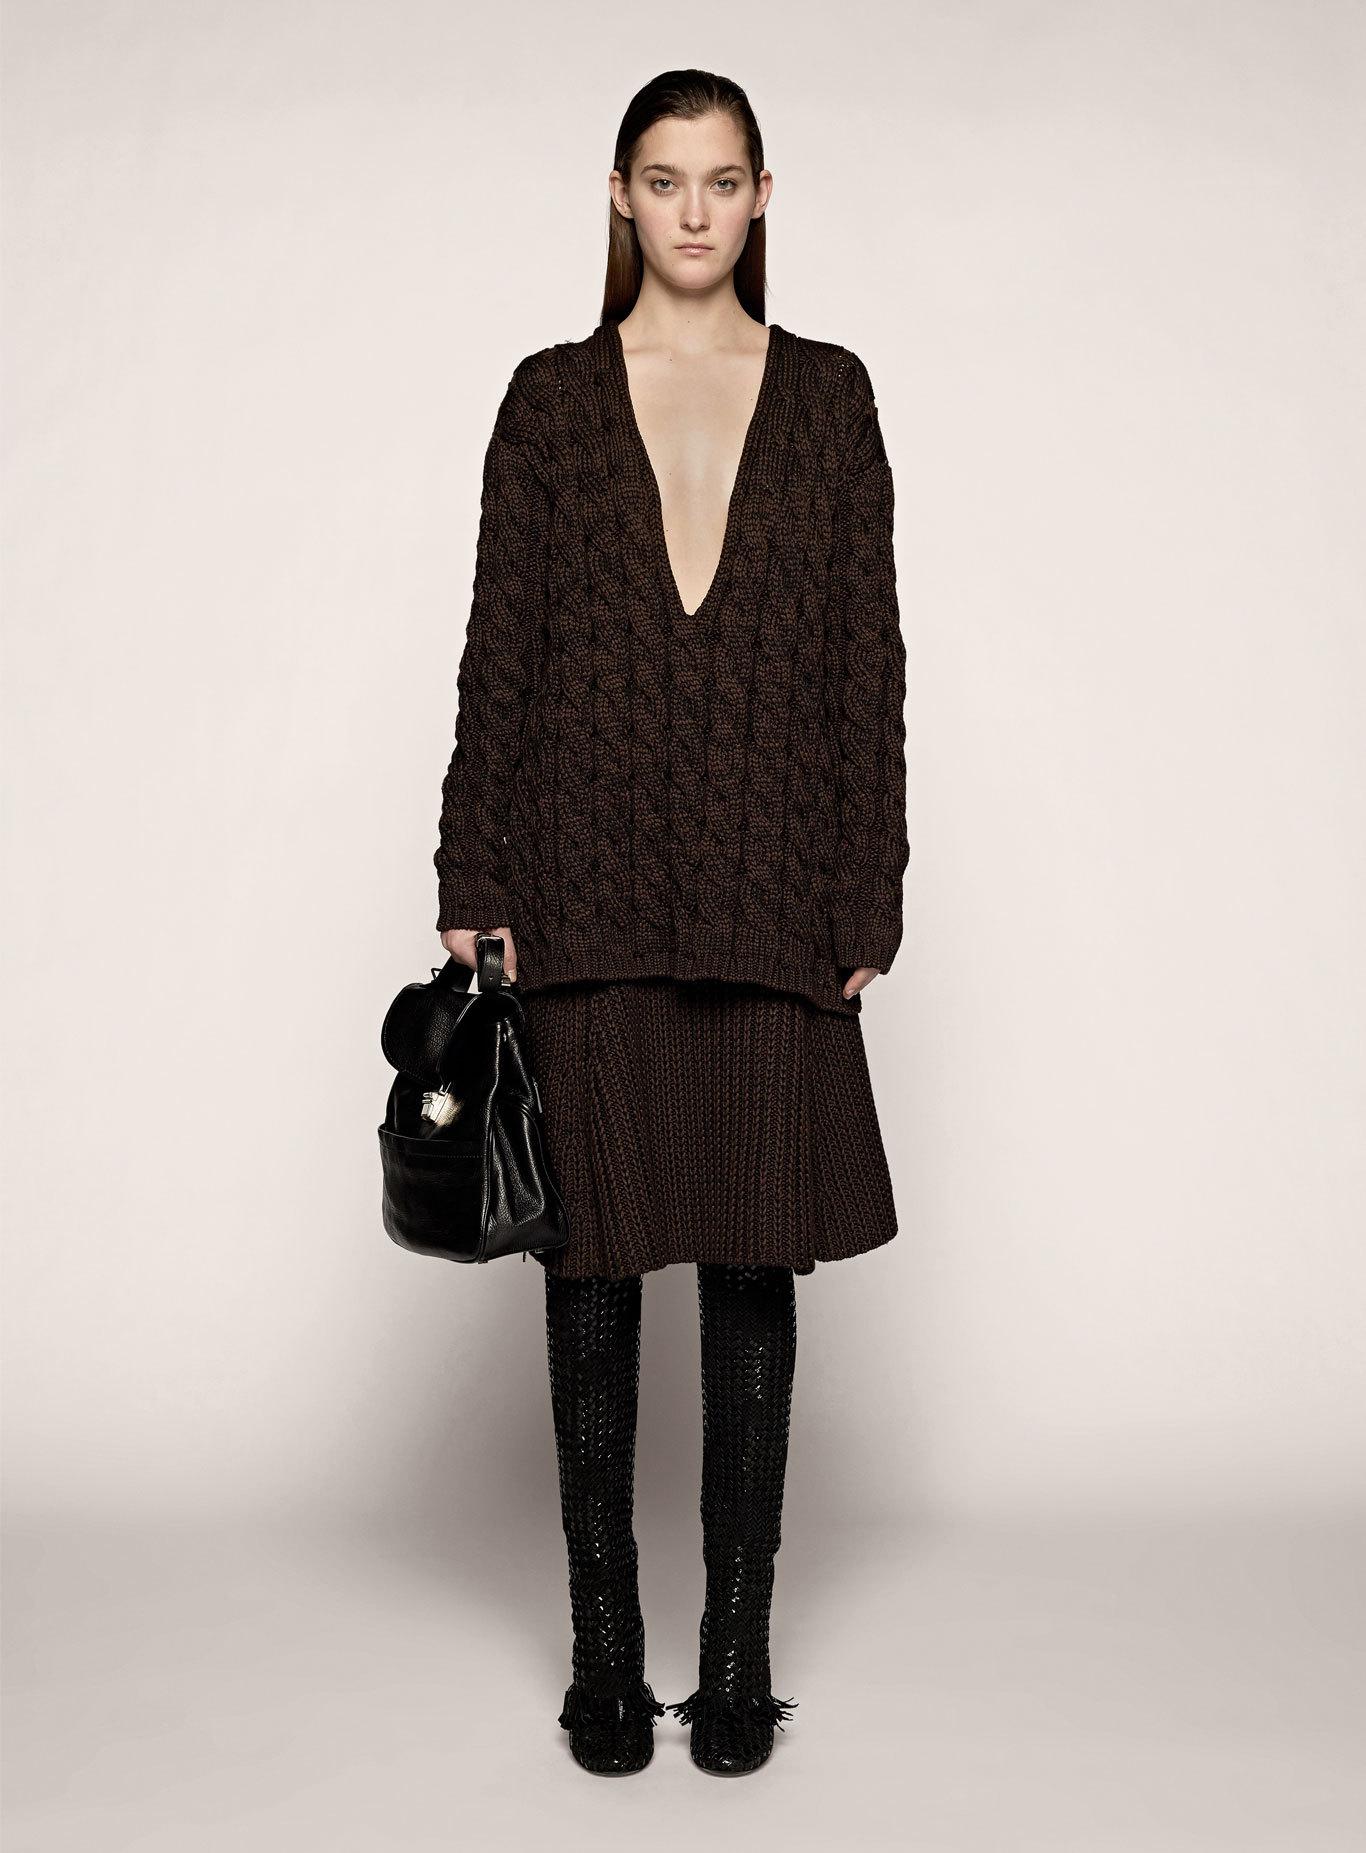 proenza schouler knit a line skirt in black chocolate